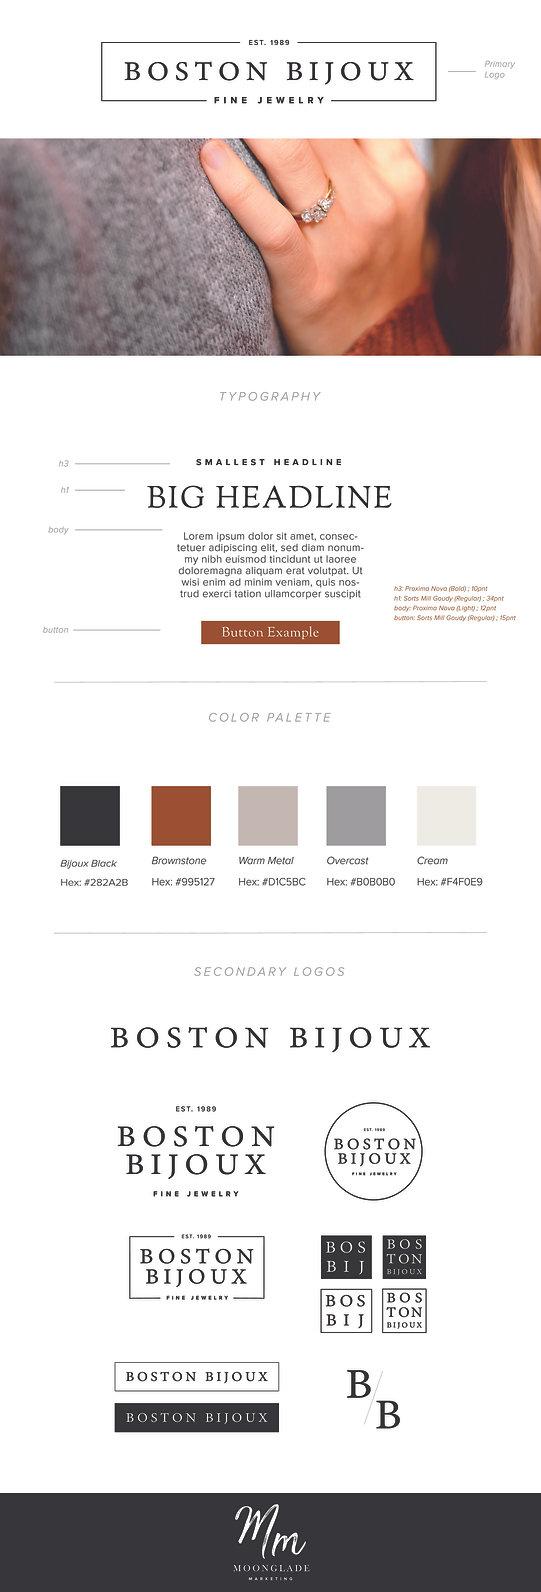 Boston Bijoux Brand PDF.jpg